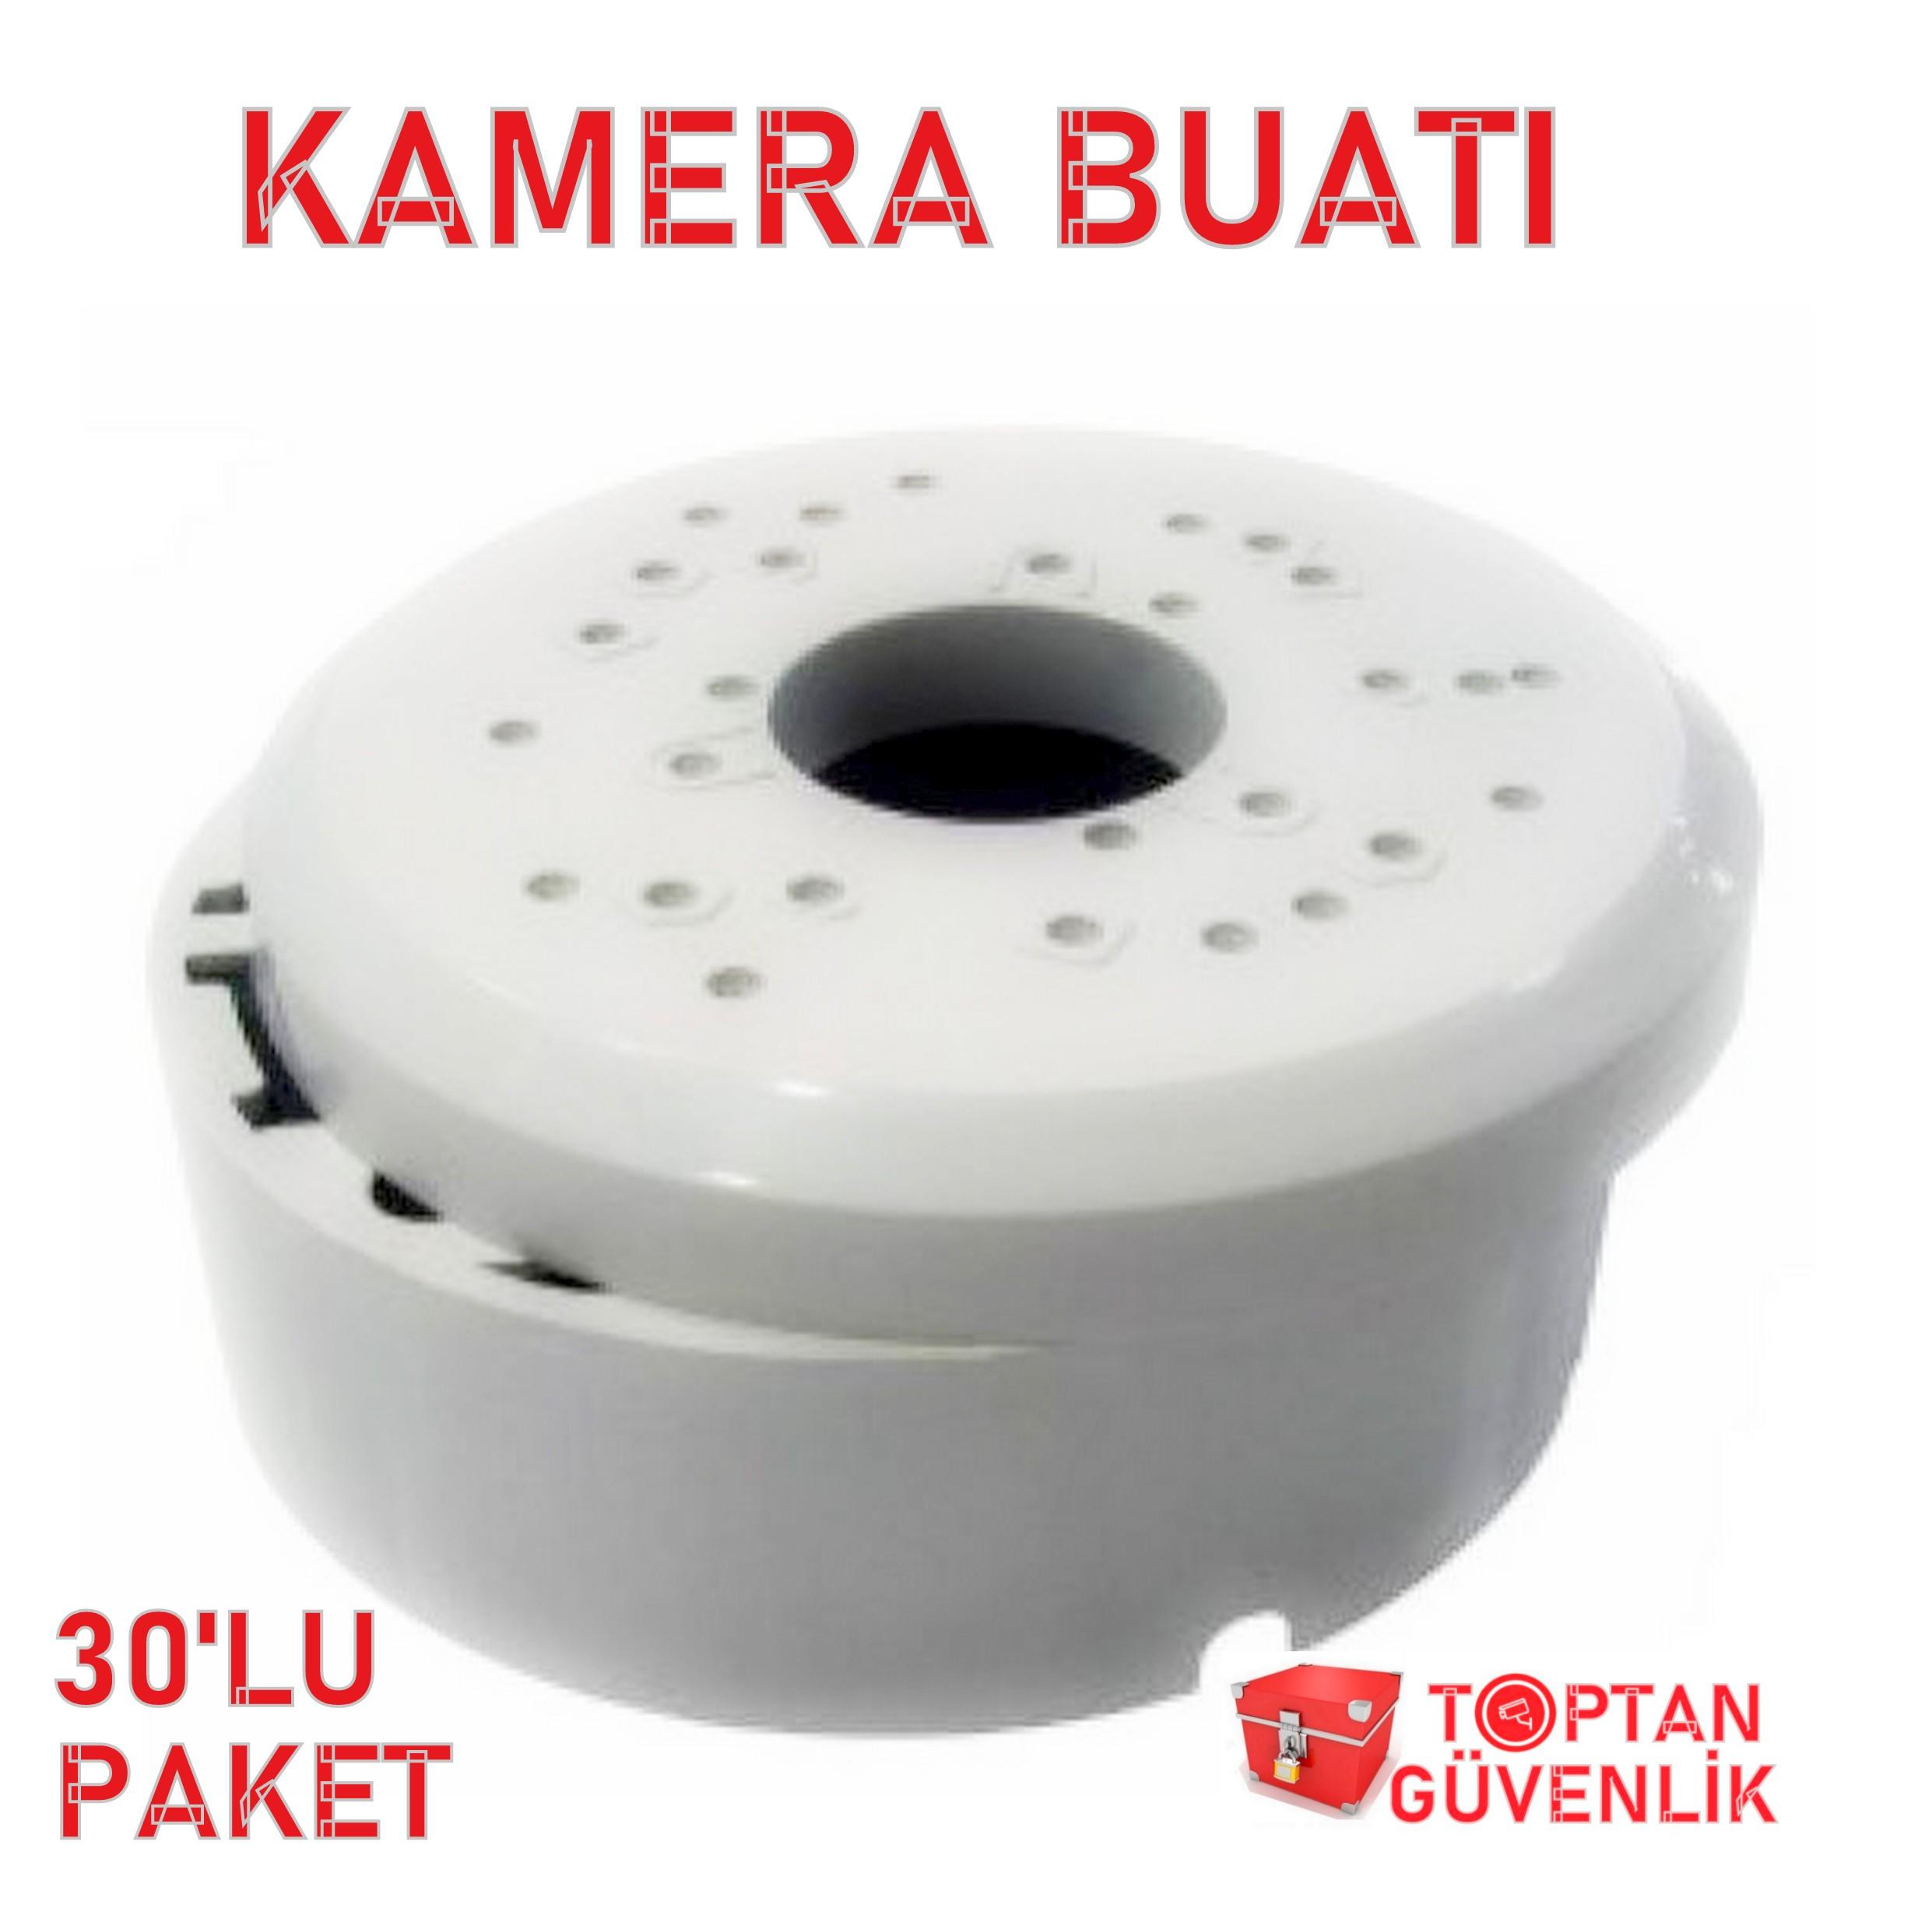 KAMERA MONTAJ BUATI 30'LU PAKET ARNA-6230 fiyatı fiyatları